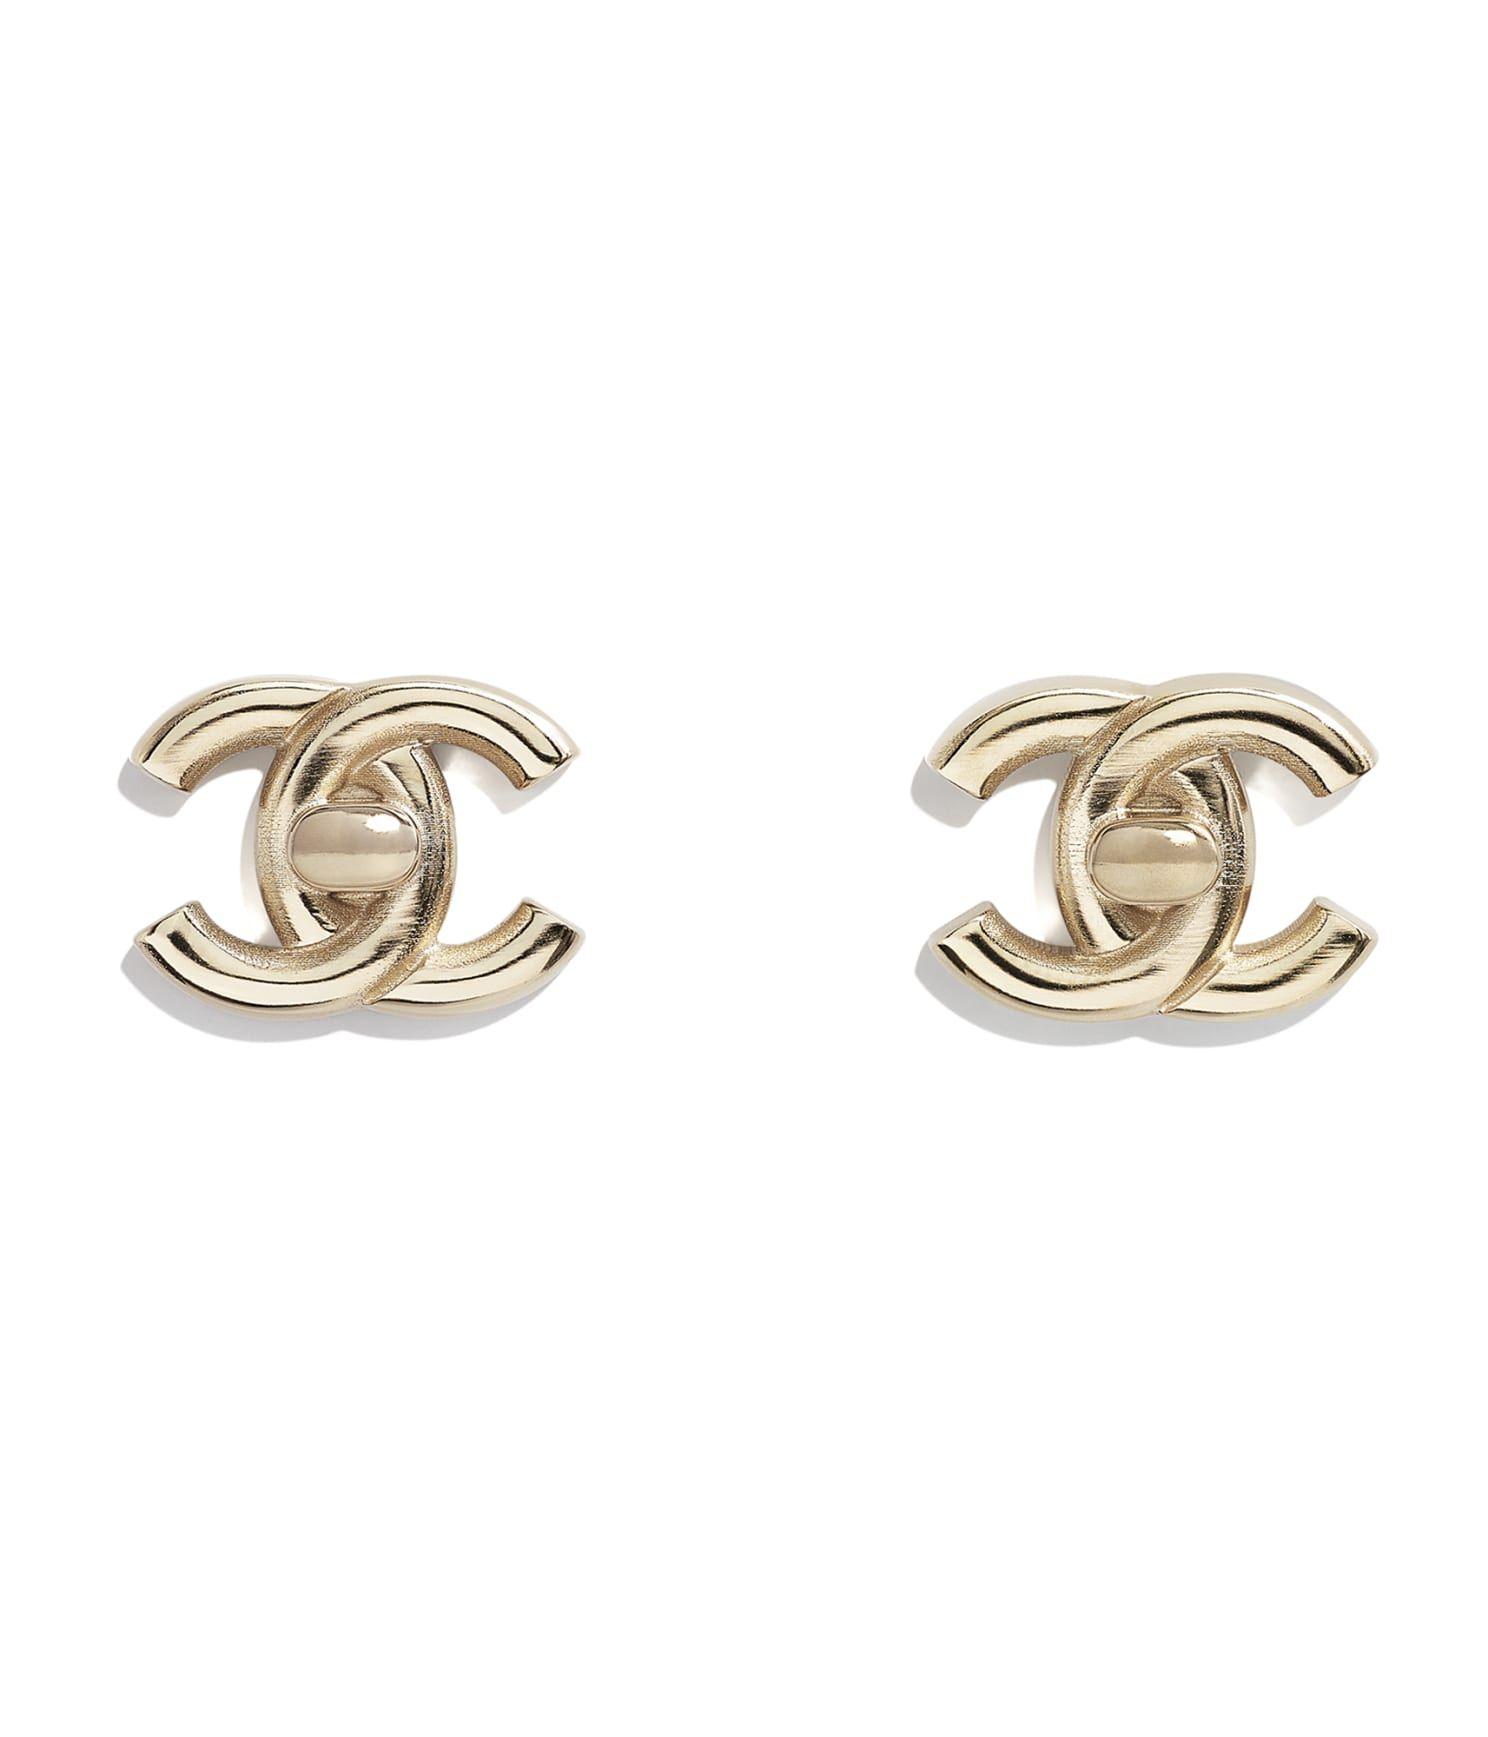 CHANEL 金屬耳環,建議售價 NT$13,000